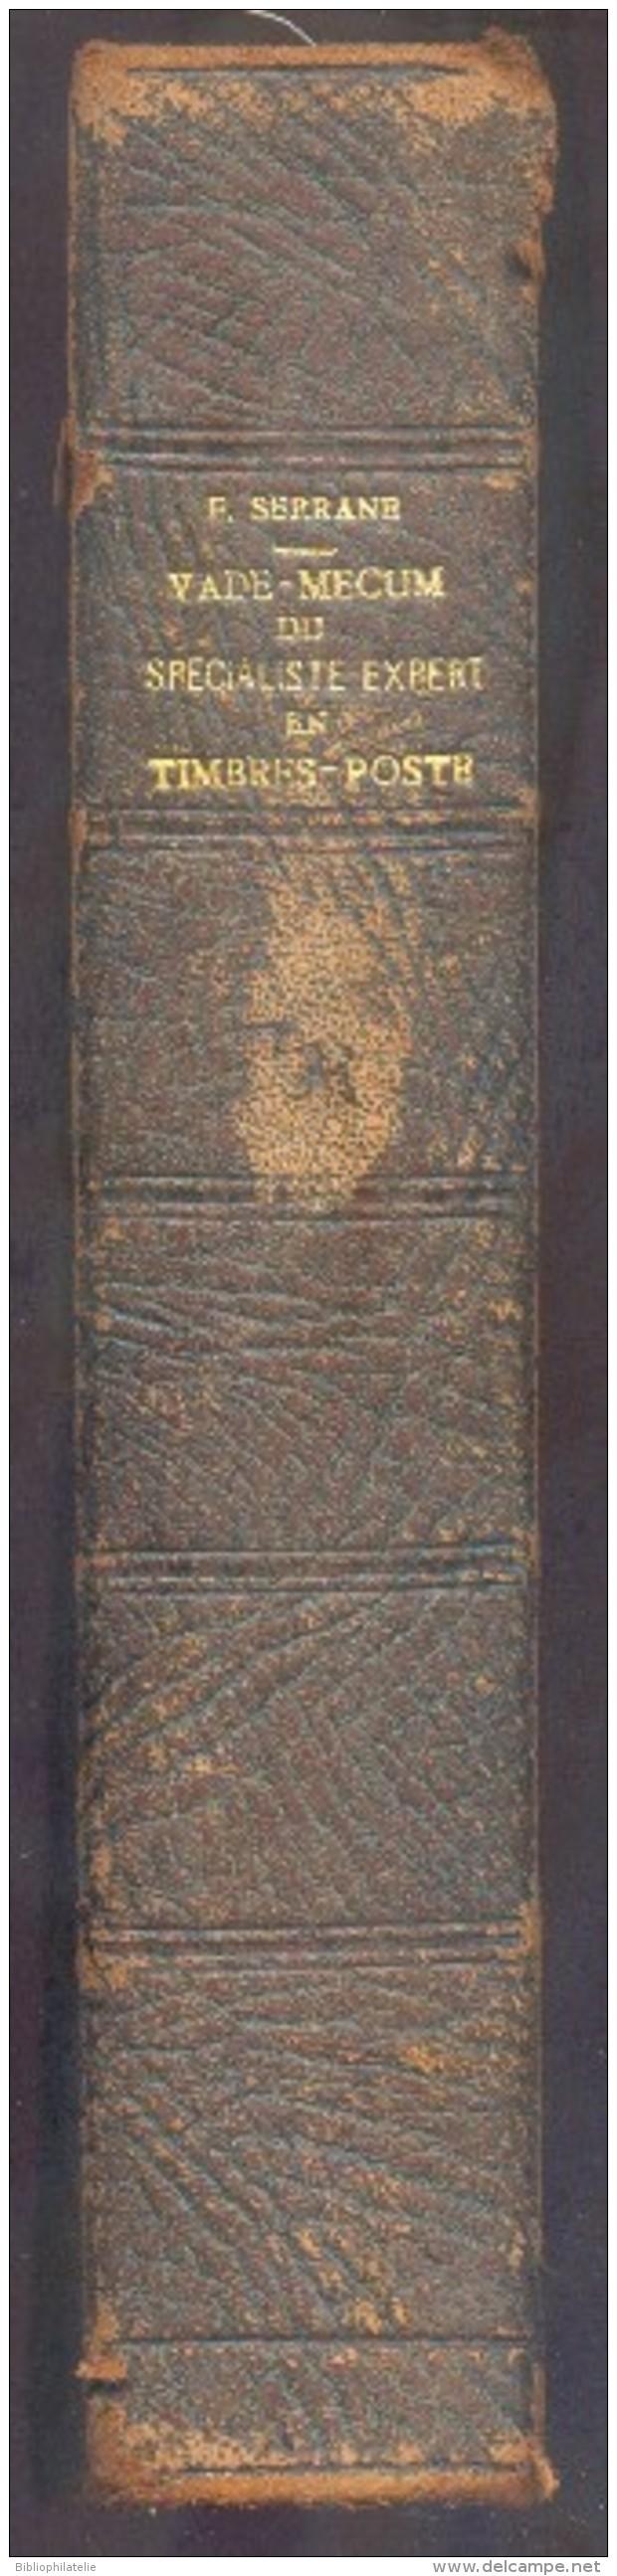 SERRANE Fernand, VADE-MECUM Du SPECIALISTE-EXPERT En TImbres-Poste D'EUROPE (Tome I) Et HORS-EUROPE (Tome II), Nice, 192 - Faux Et Reproductions